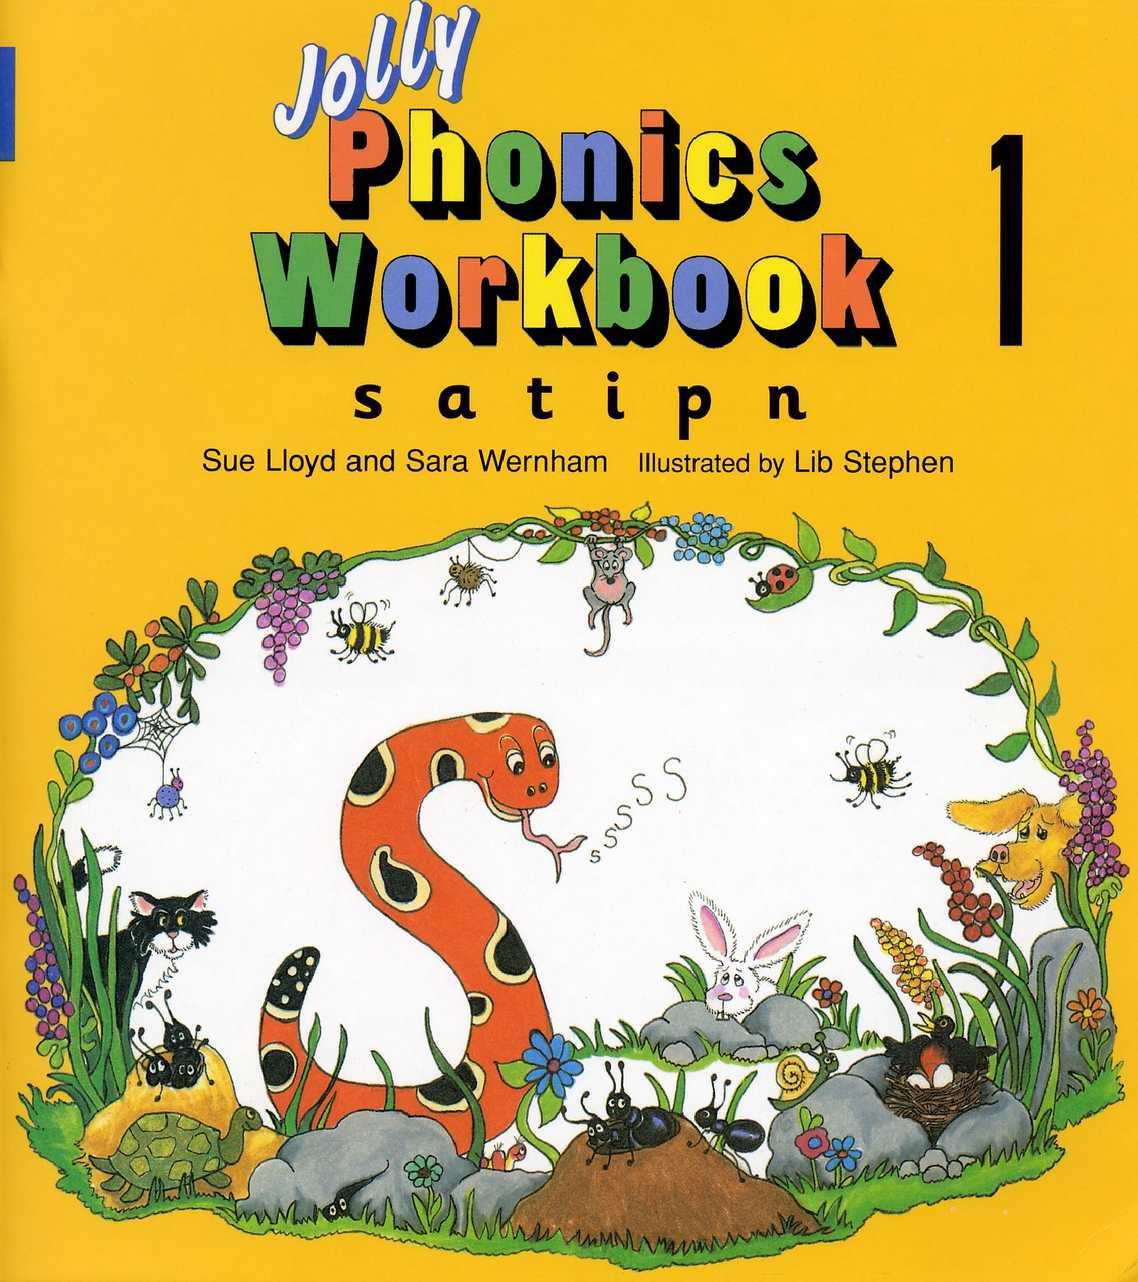 Jolly Phonics Workbook 1 pdf - CALAMEO Downloader